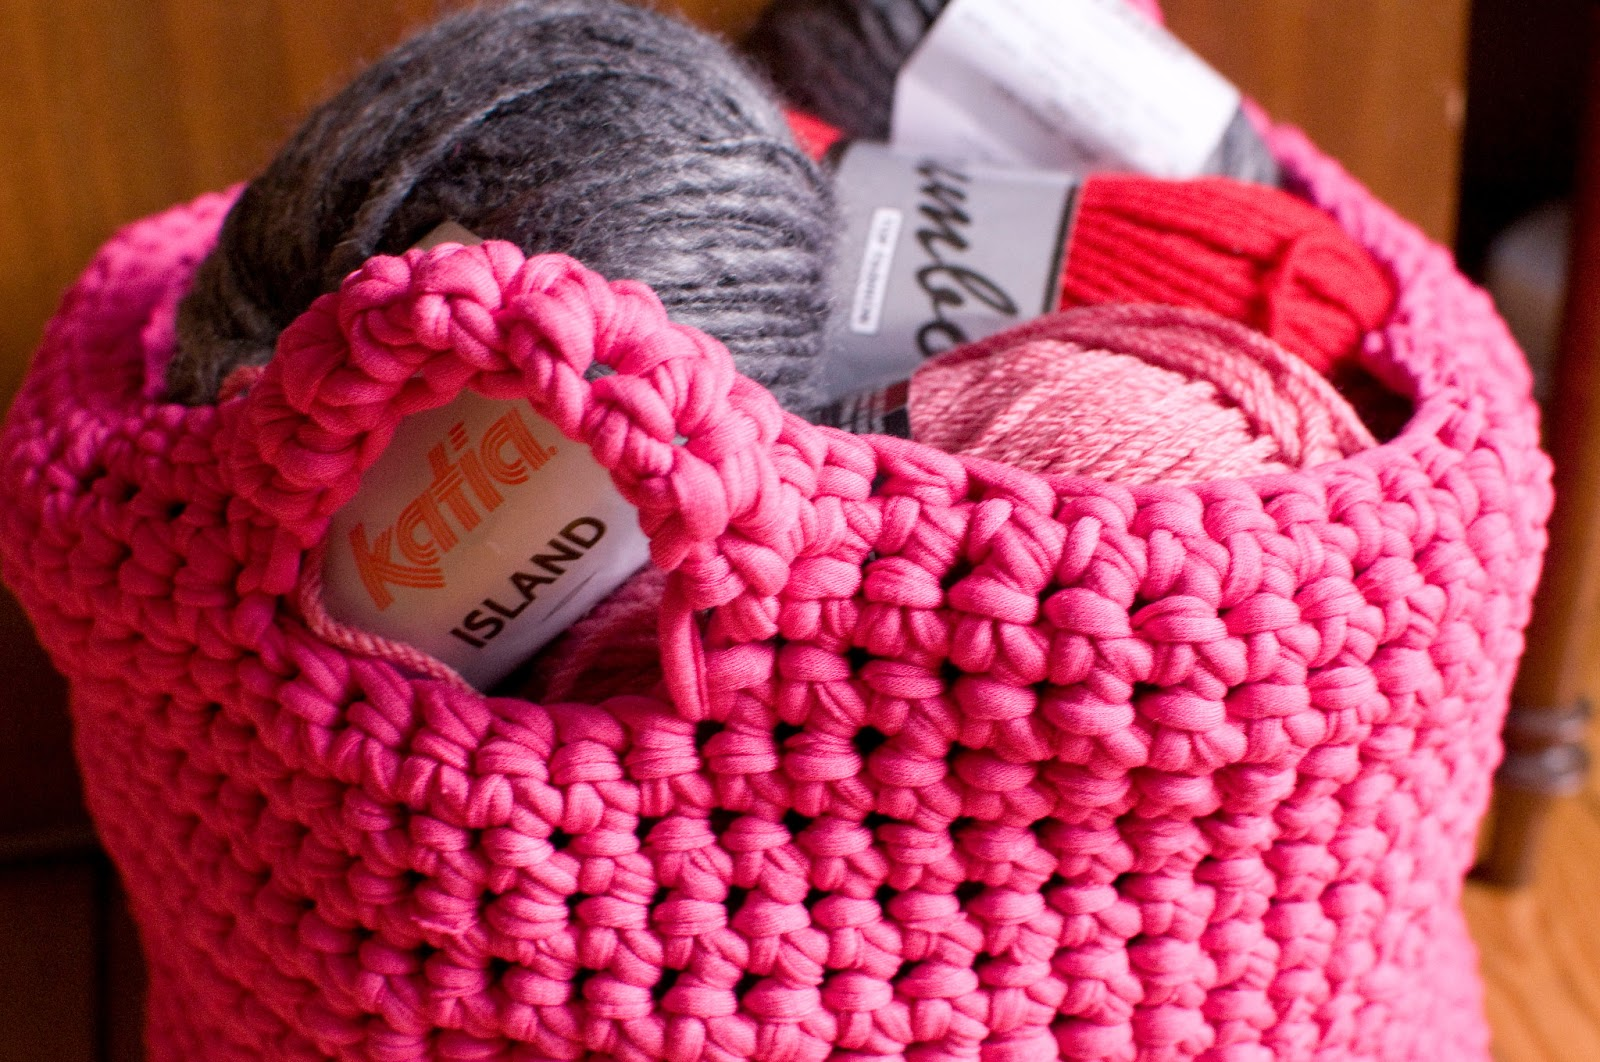 Sac Panier Crochet : Couture tricot mamzelle angele panier crochet?